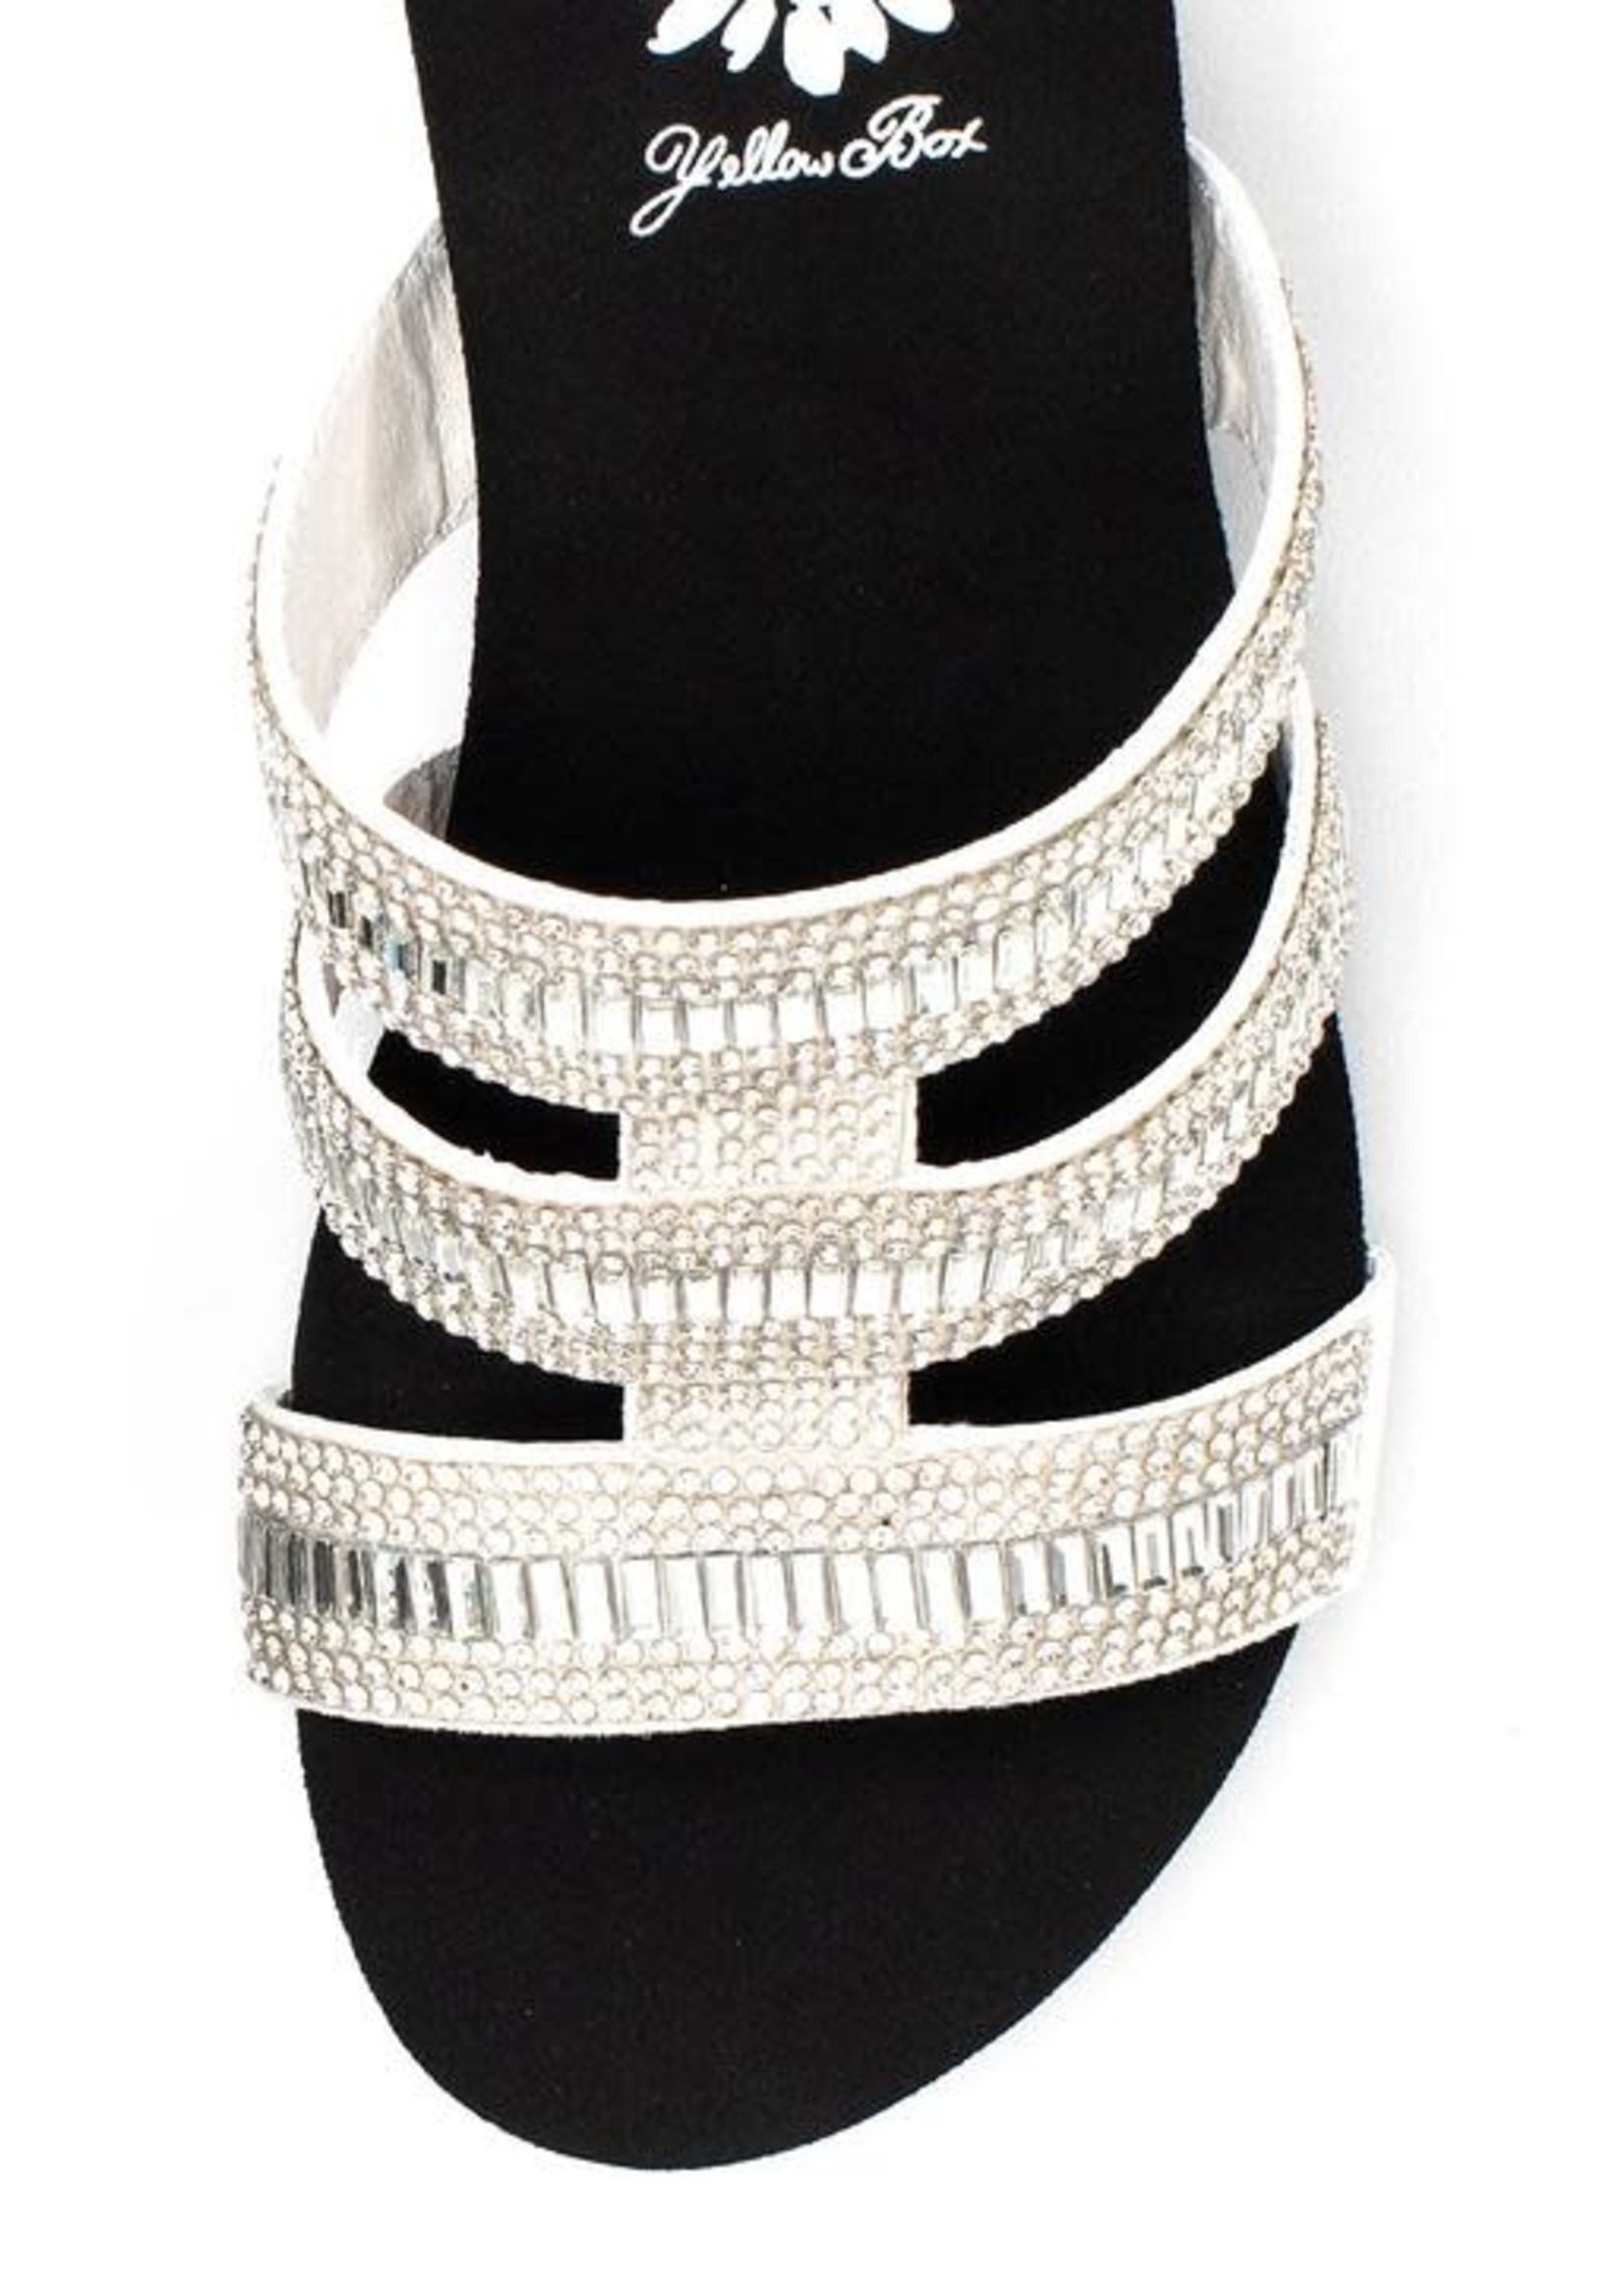 Segrid Bling Wedge Sandals